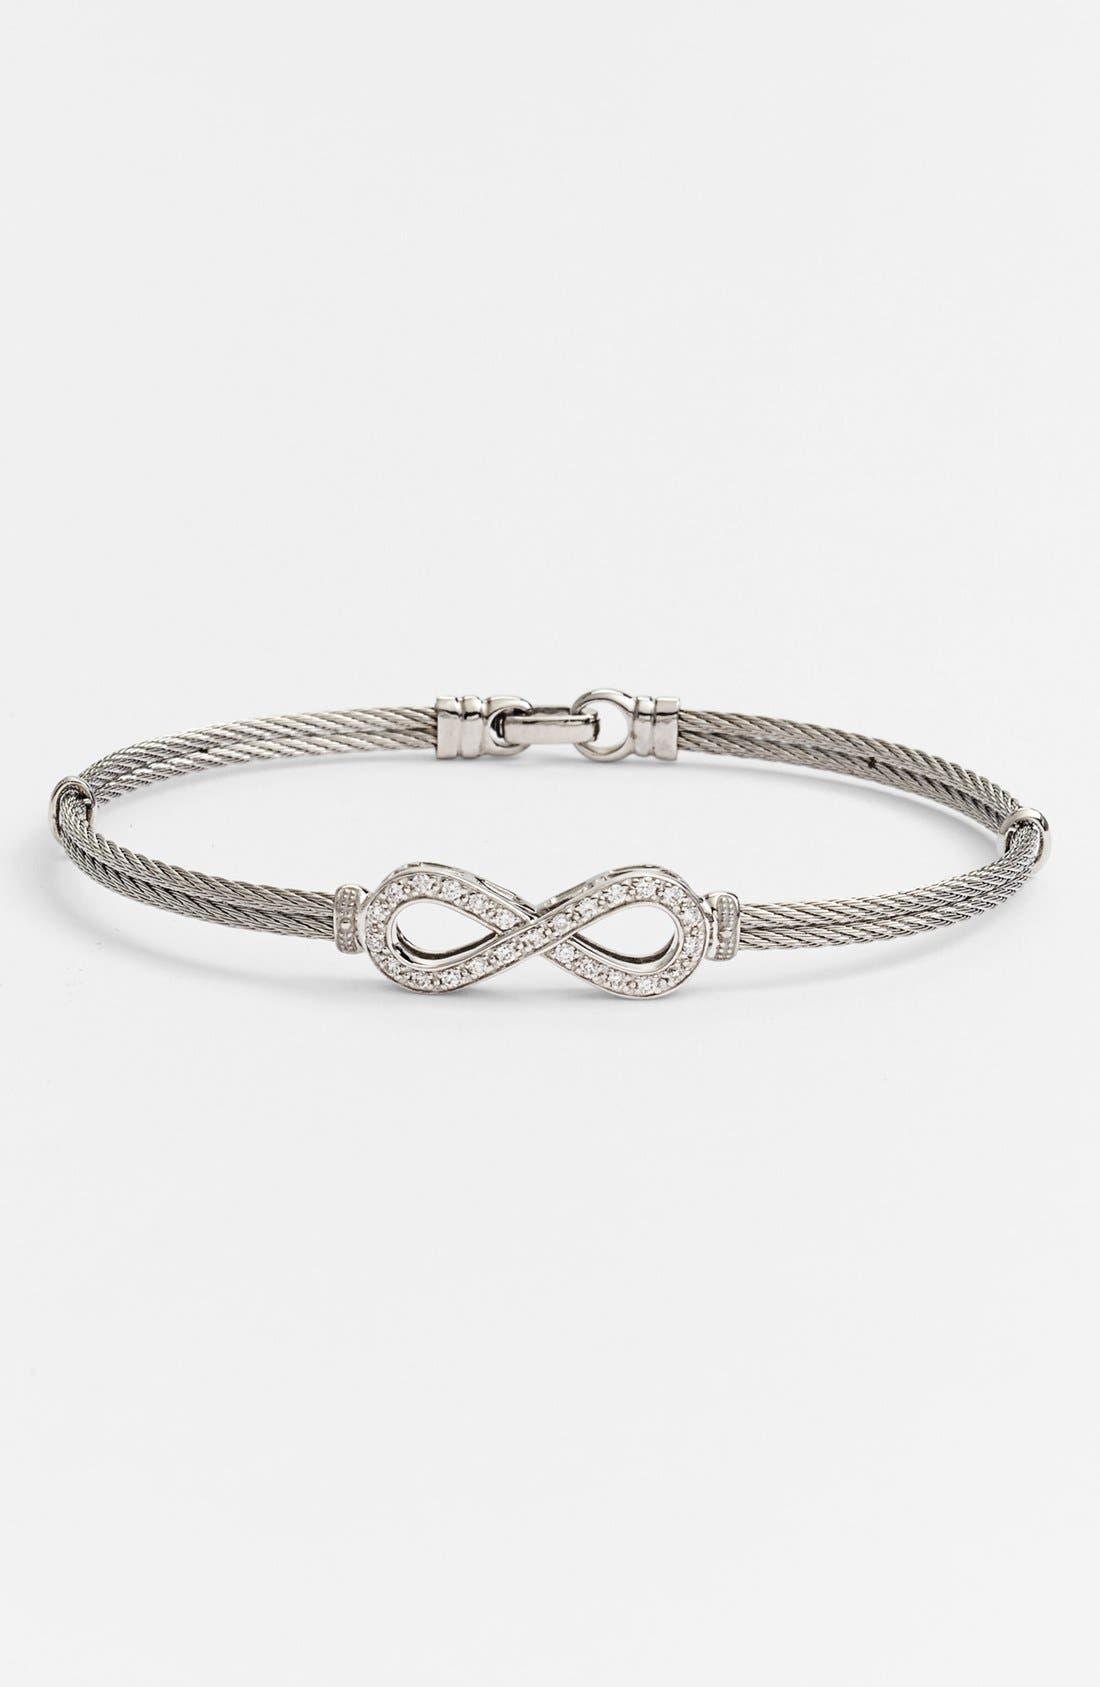 Alternate Image 1 Selected - ALOR® Infinity Symbol Station Bracelet